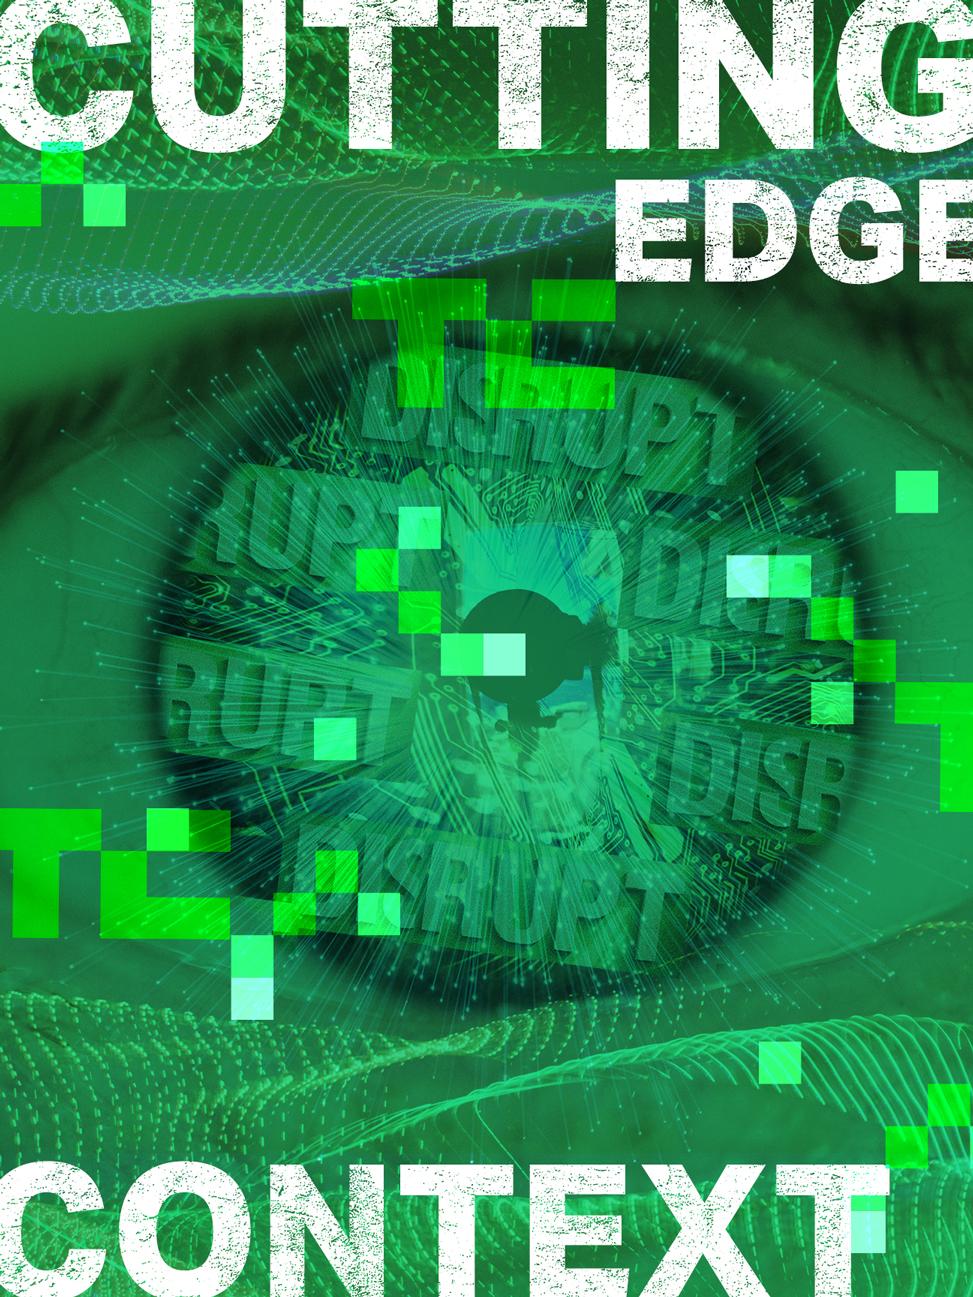 TechCrunch: Cutting edge context